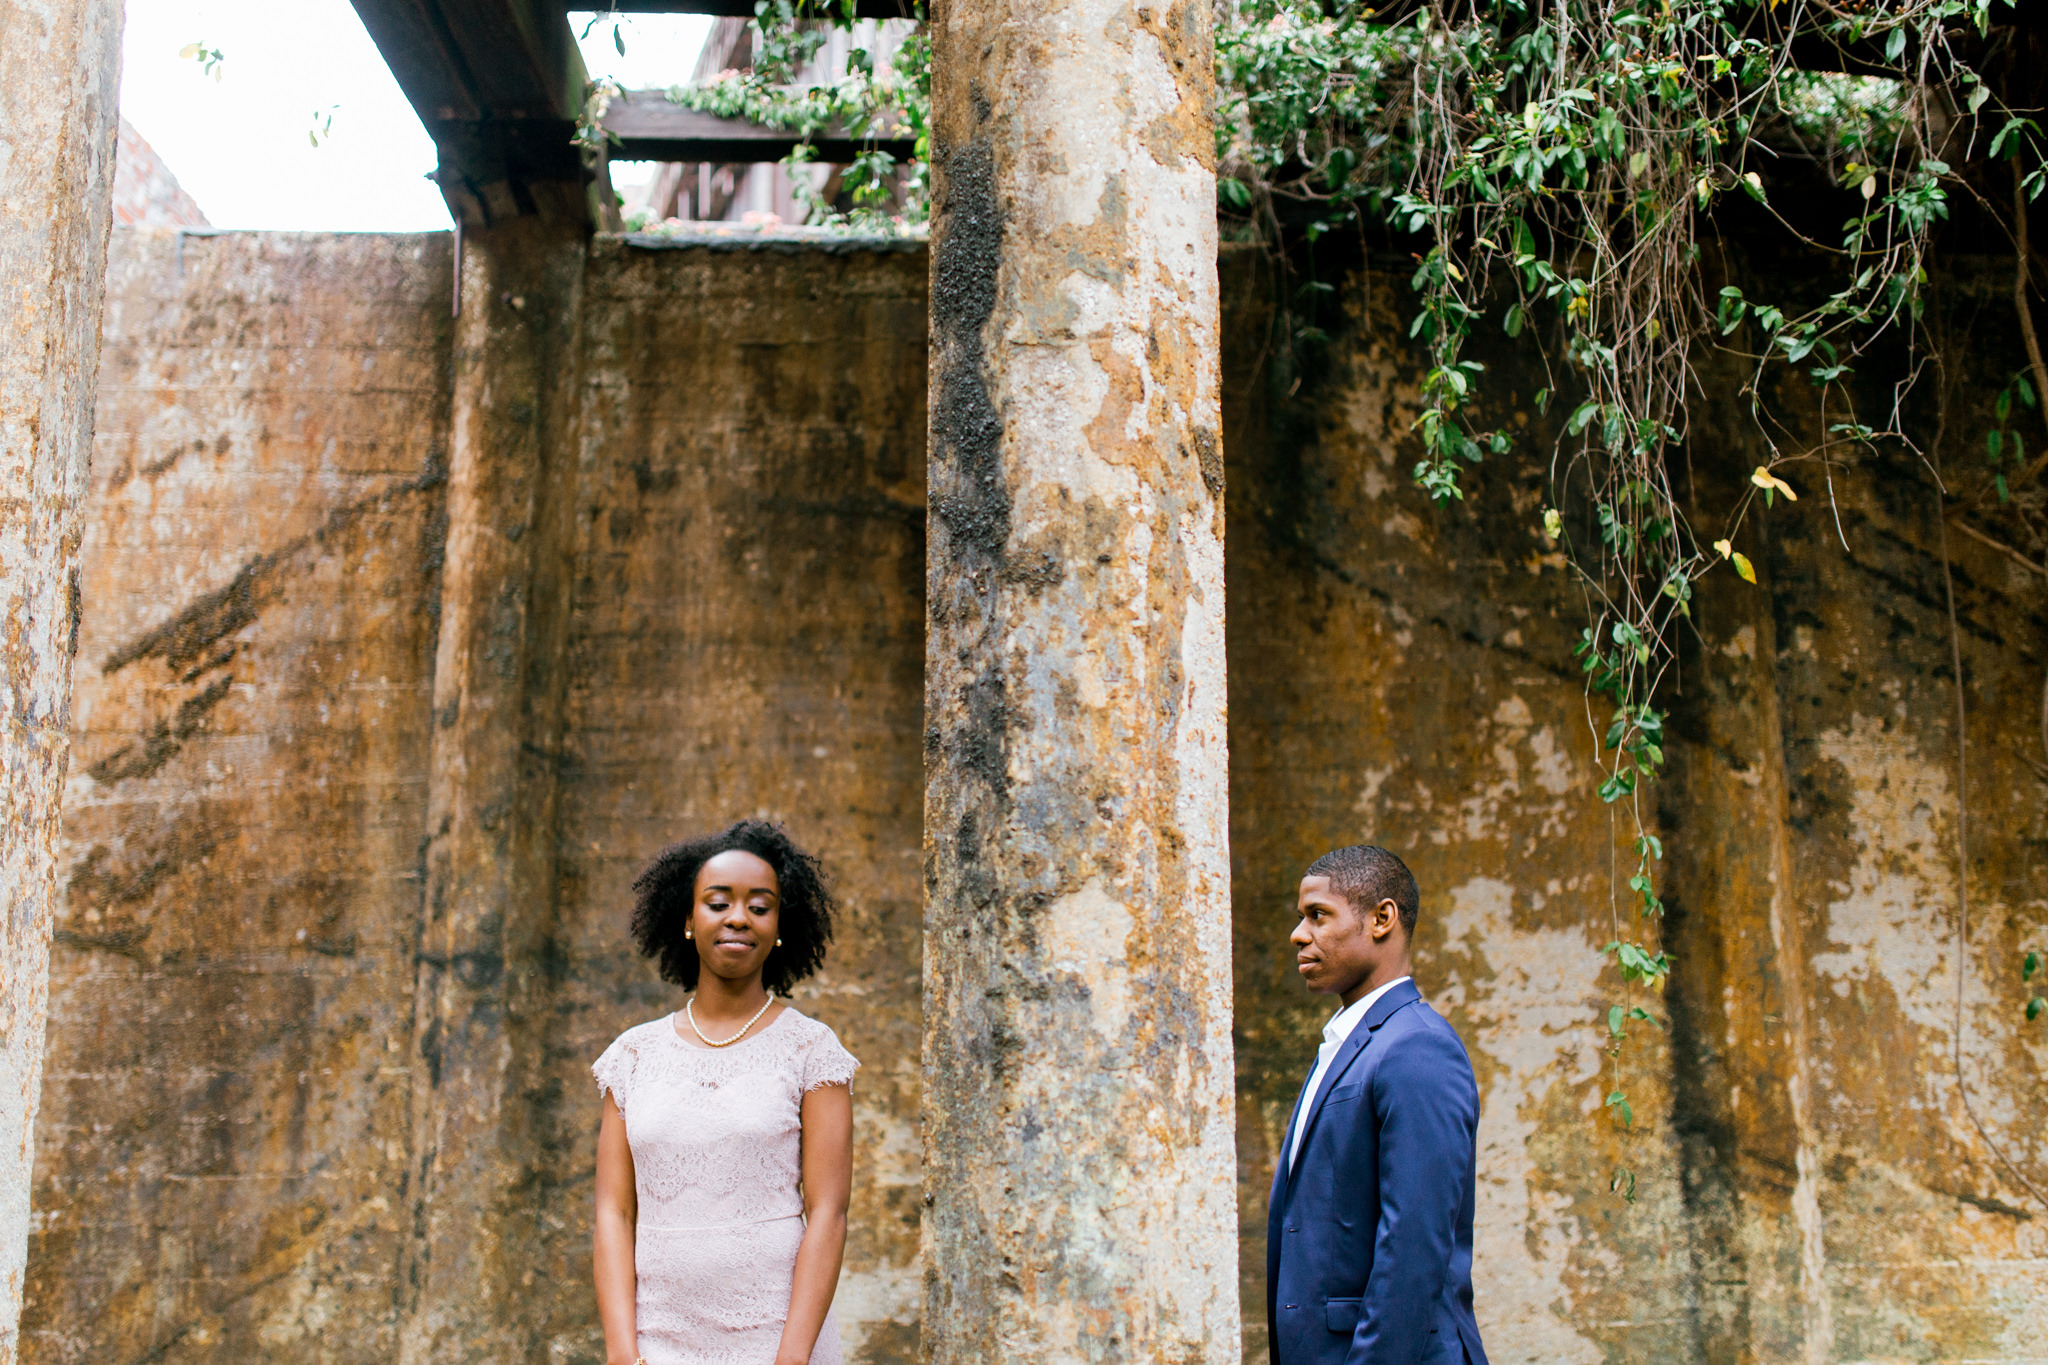 Grant-Park-Atlanta-Engagement-Pictures-Kiyah-C-Photography-24.jpg